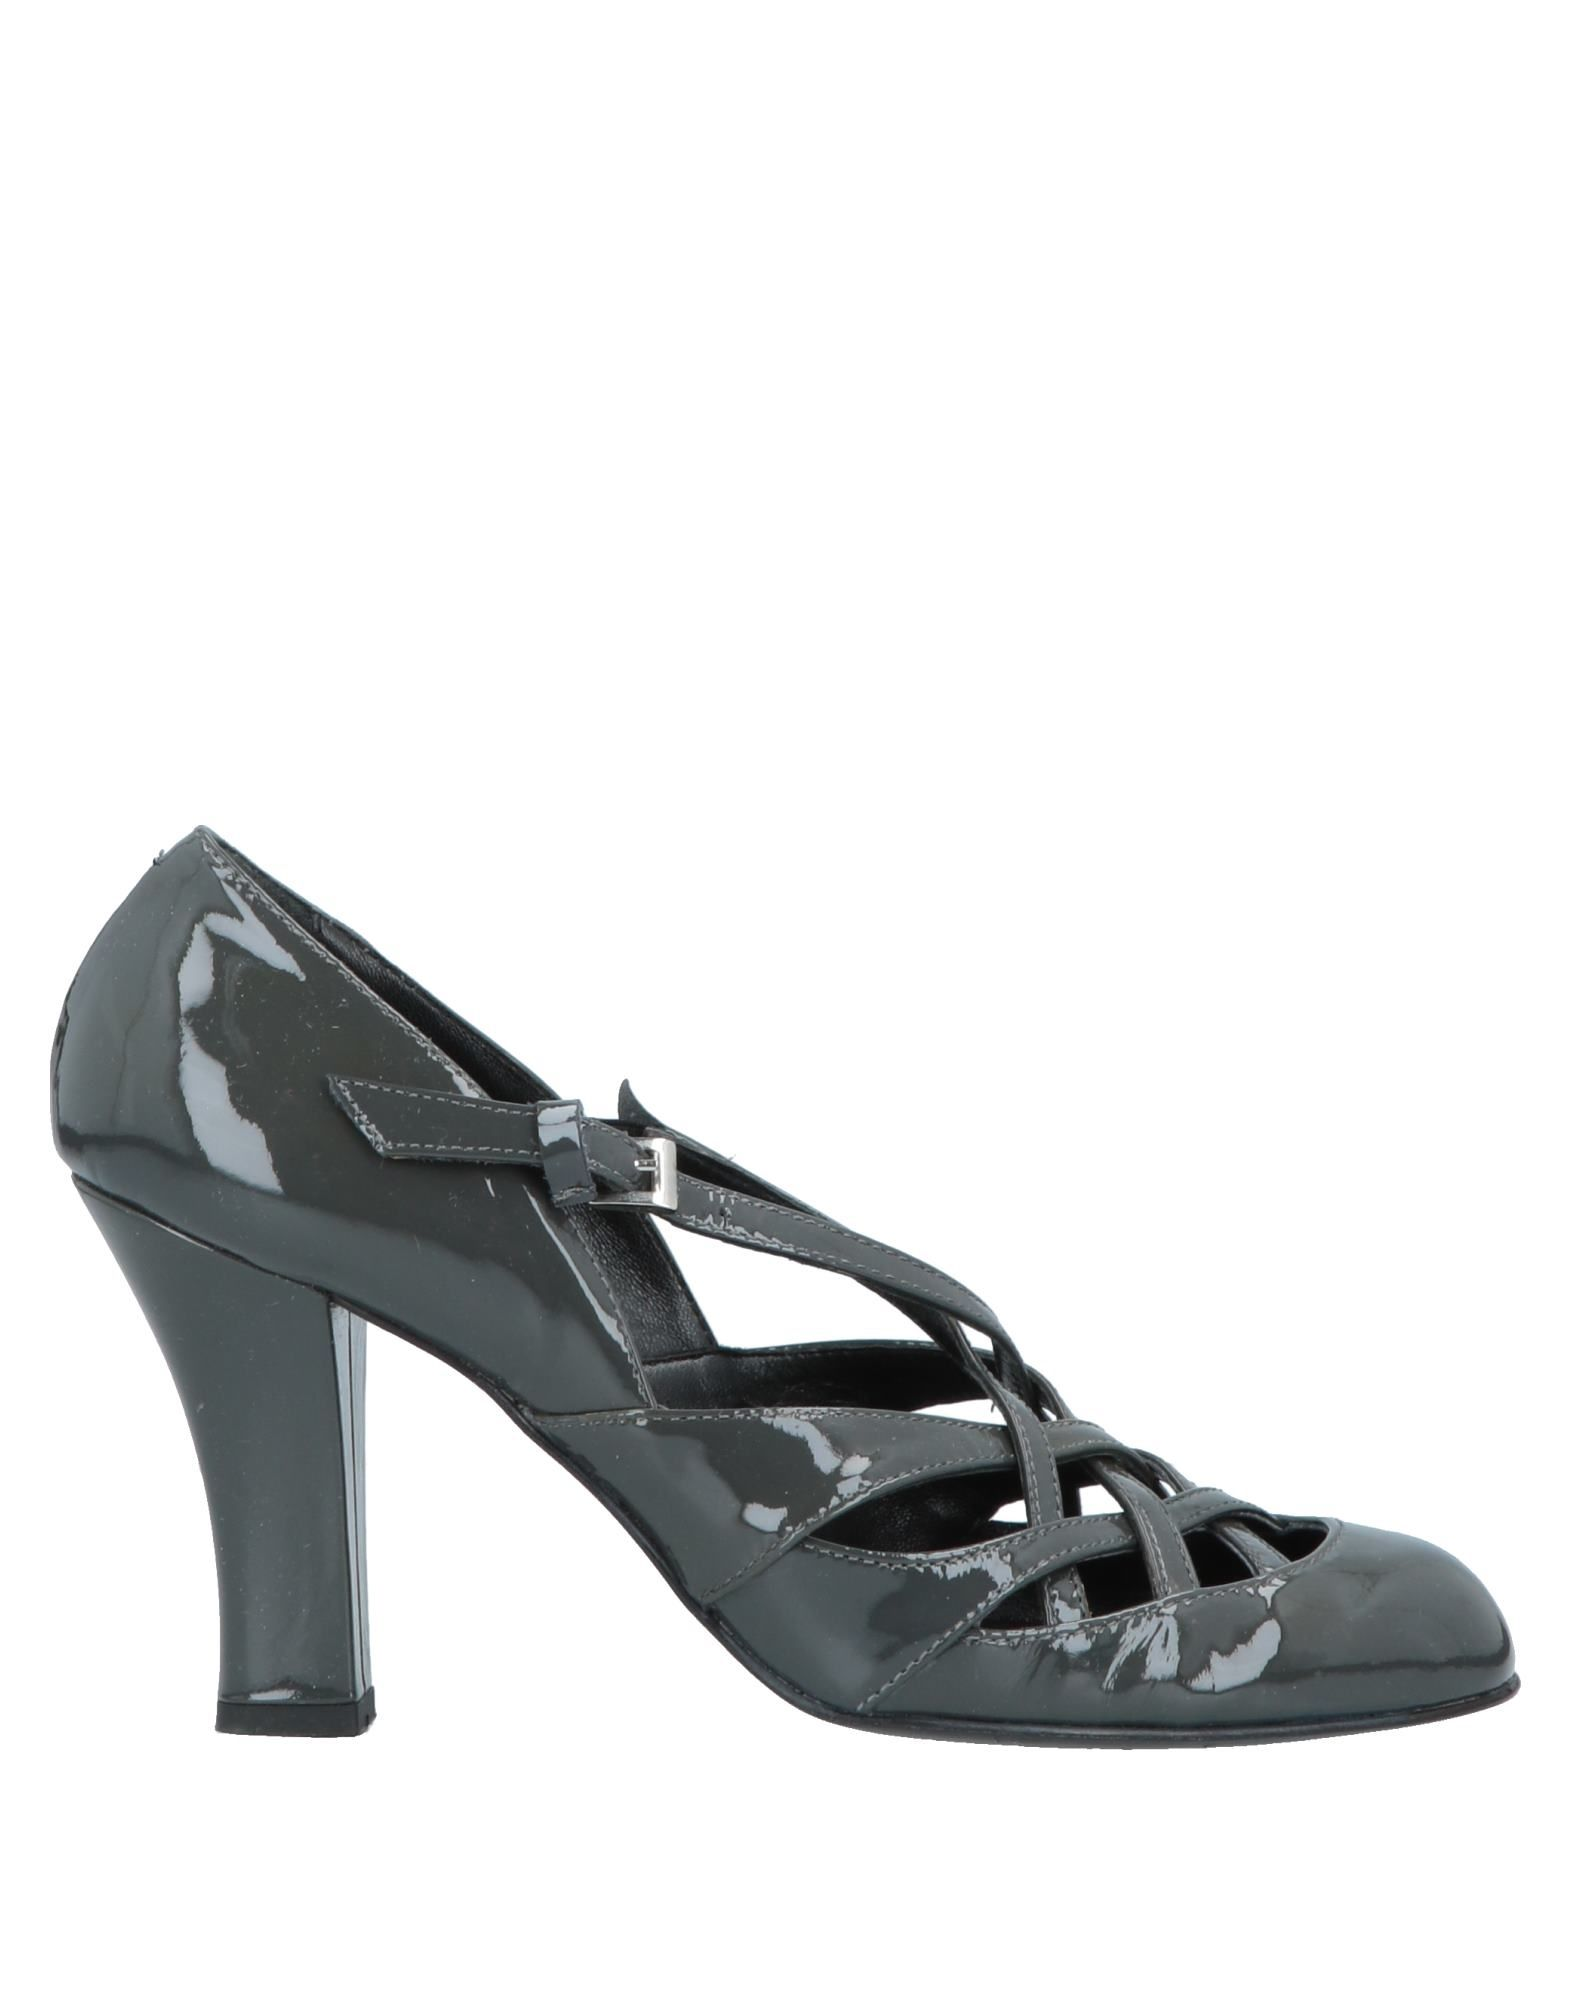 Фото - QSP+ QUELQUES SHOES DE PLUS Туфли women high heel shoes platform pumps woman thin high heels party wedding shoes ladies kitten heels plus size 34 40 41 42 43